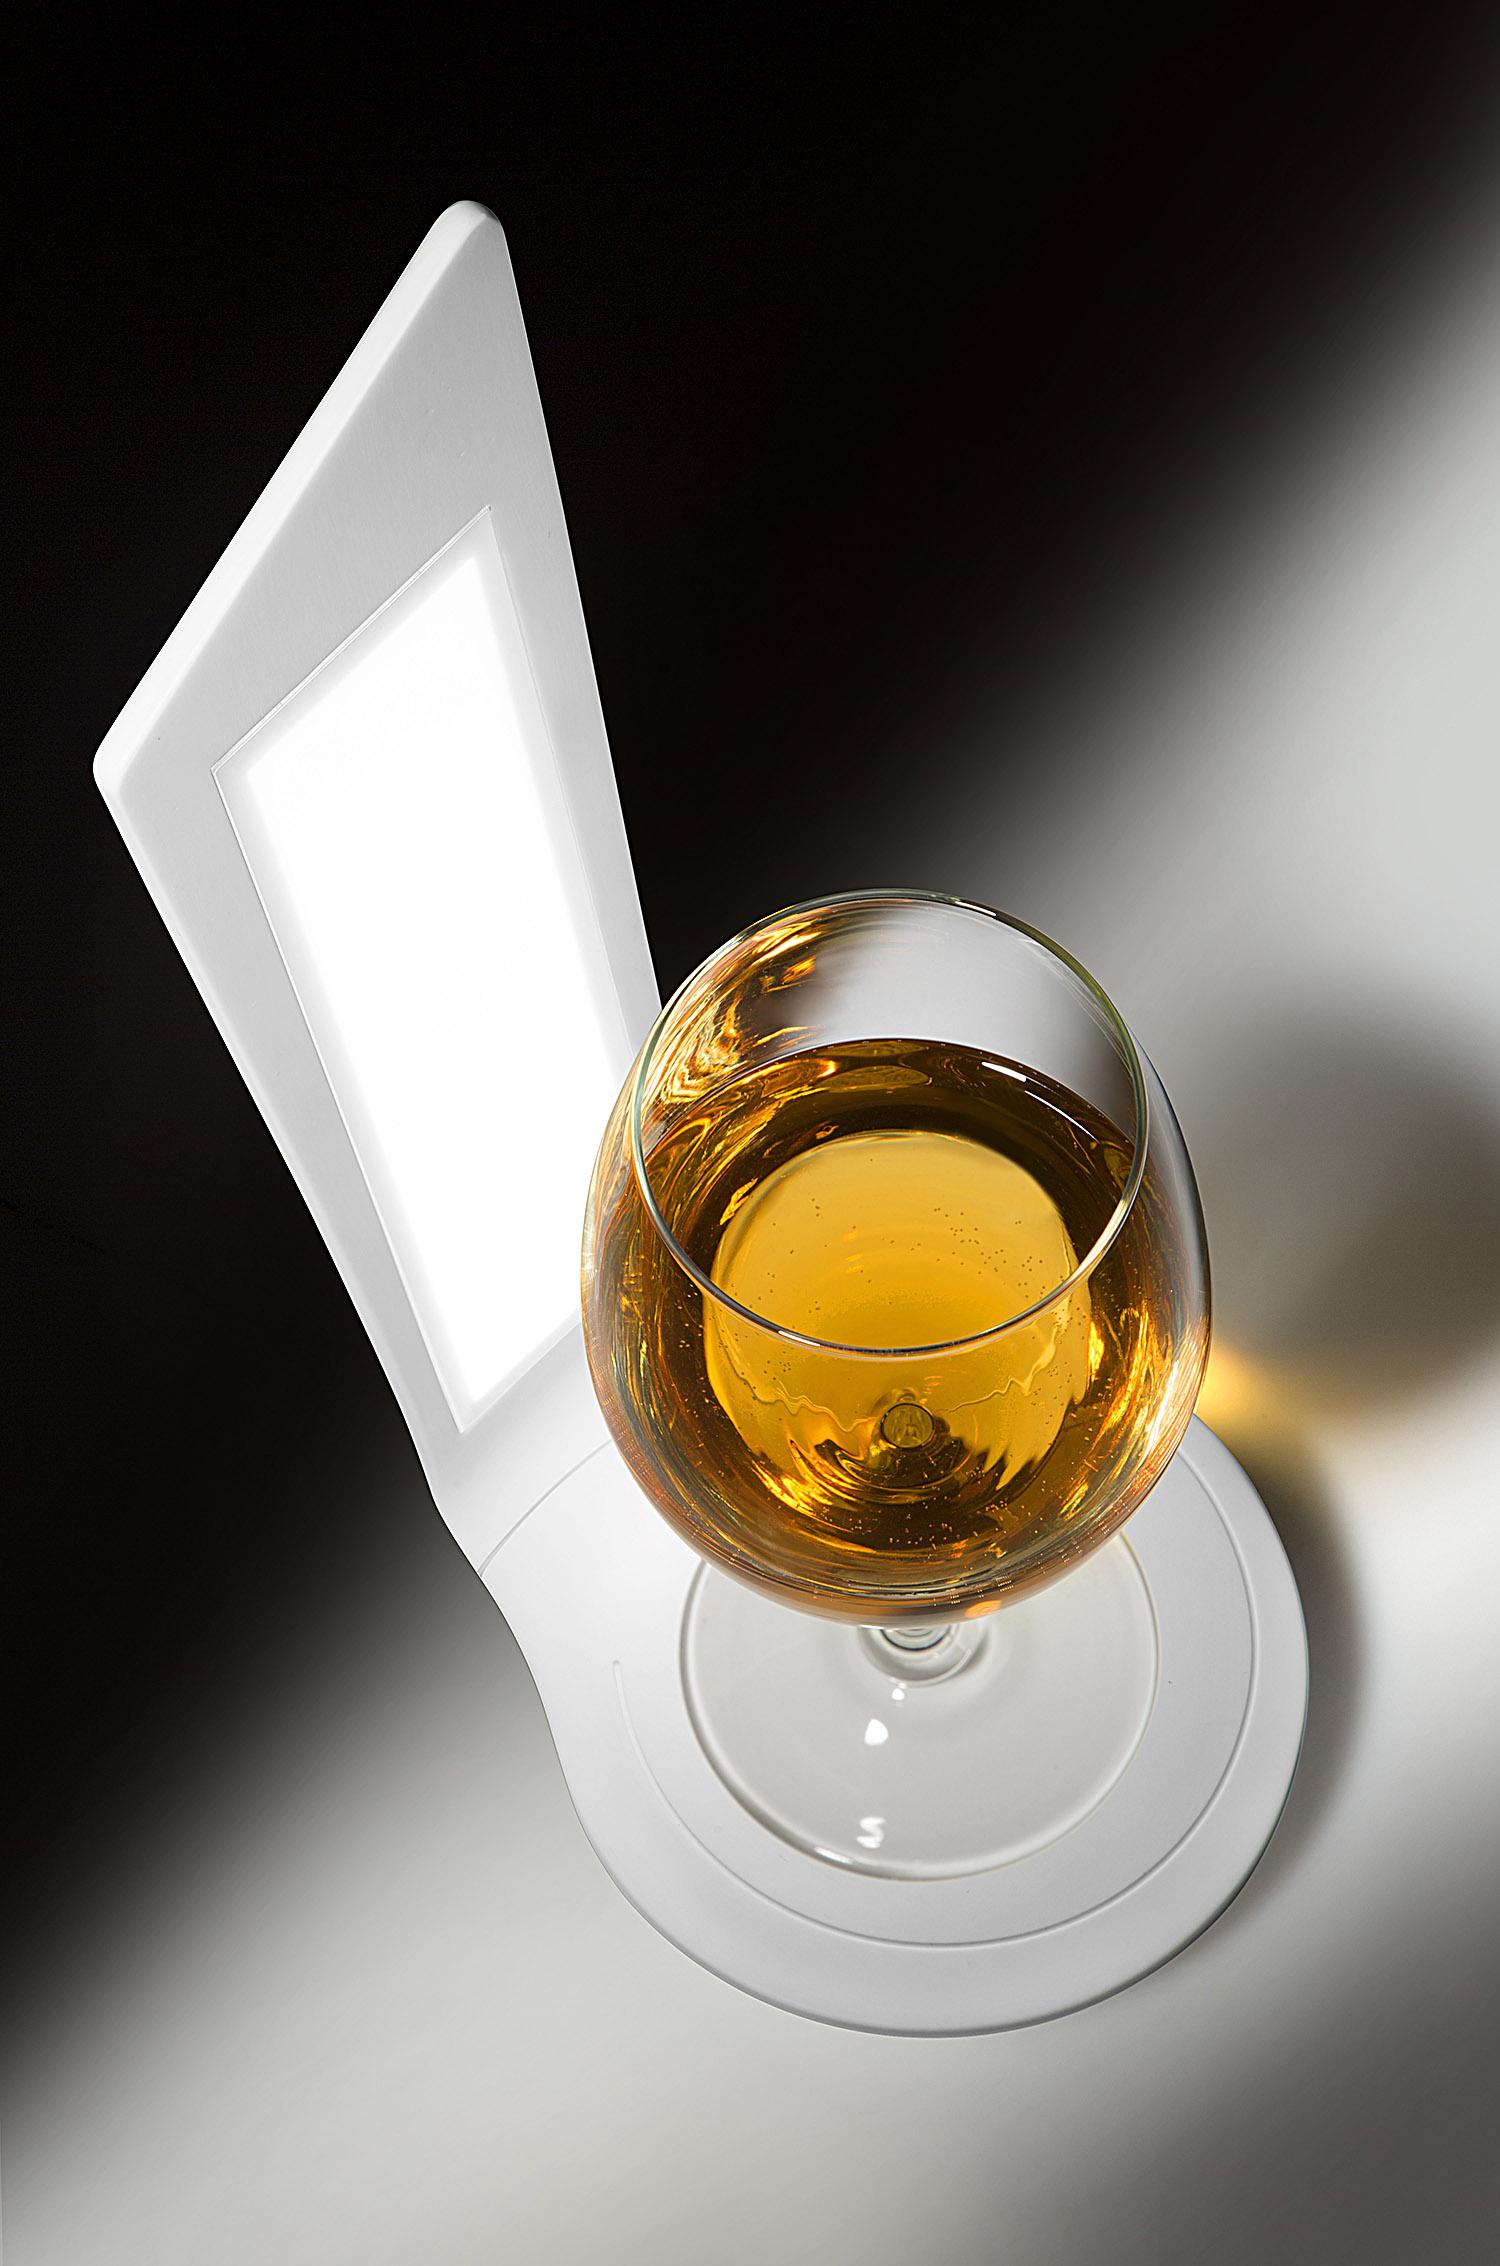 hi-macs_wineoled_wine_oled_tiziana_arici_9615